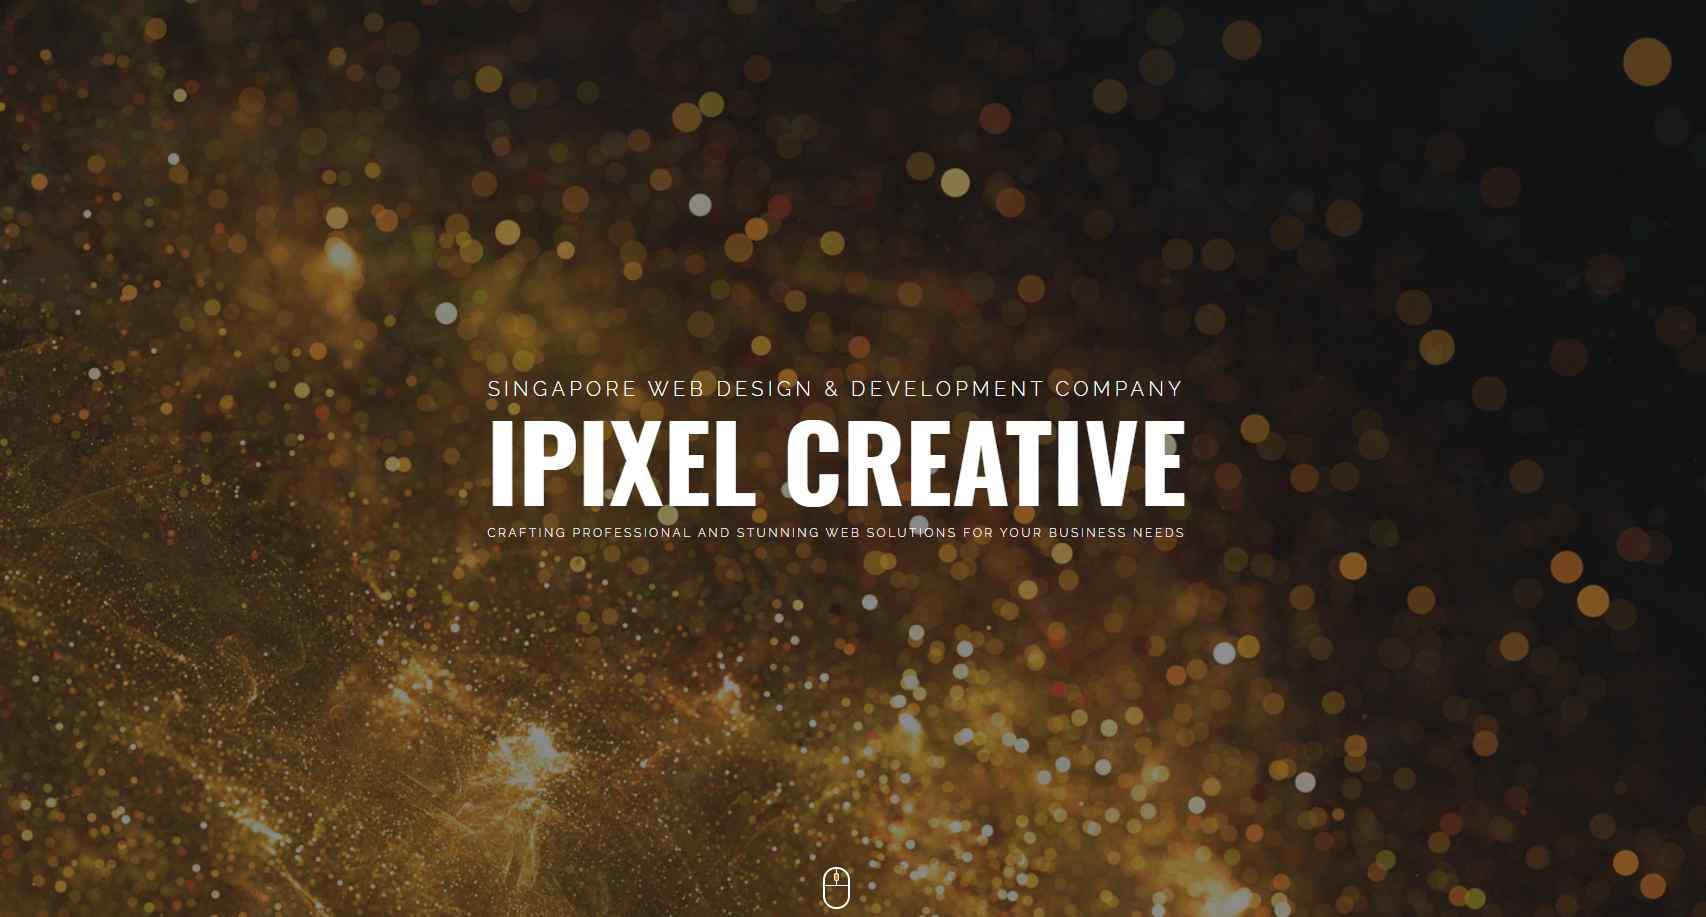 ipixel Top Digital Design Agencies in Singapore